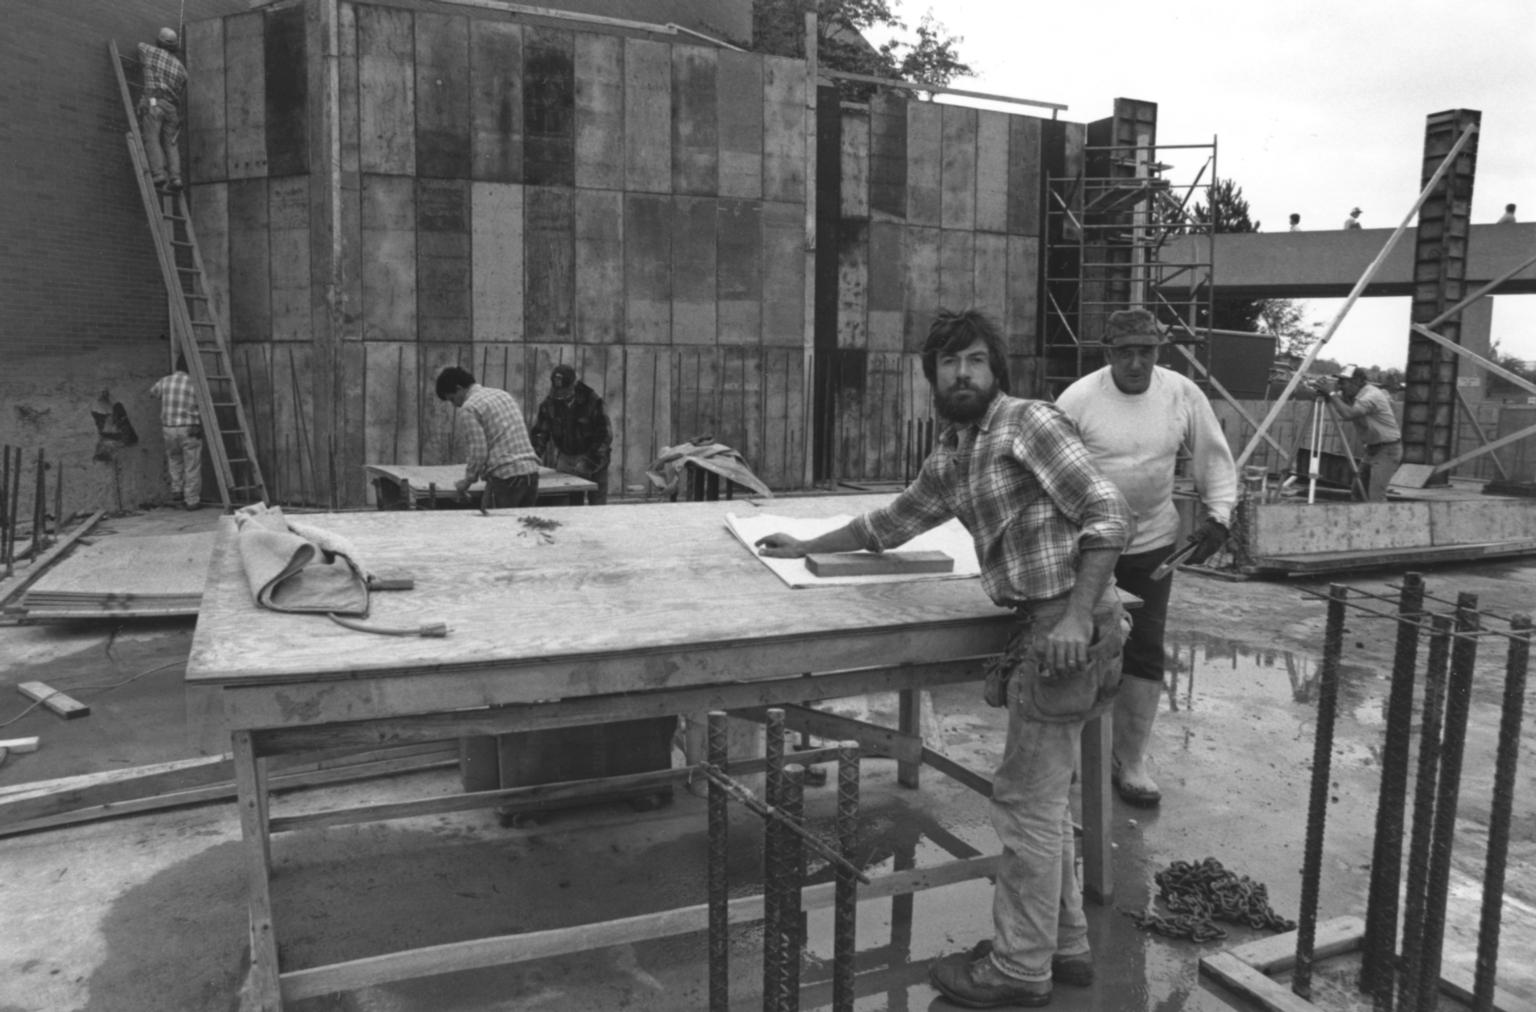 Construction Workers at the Kilian J. and Caroline F. Schmitt Interfaith Center Construction Site